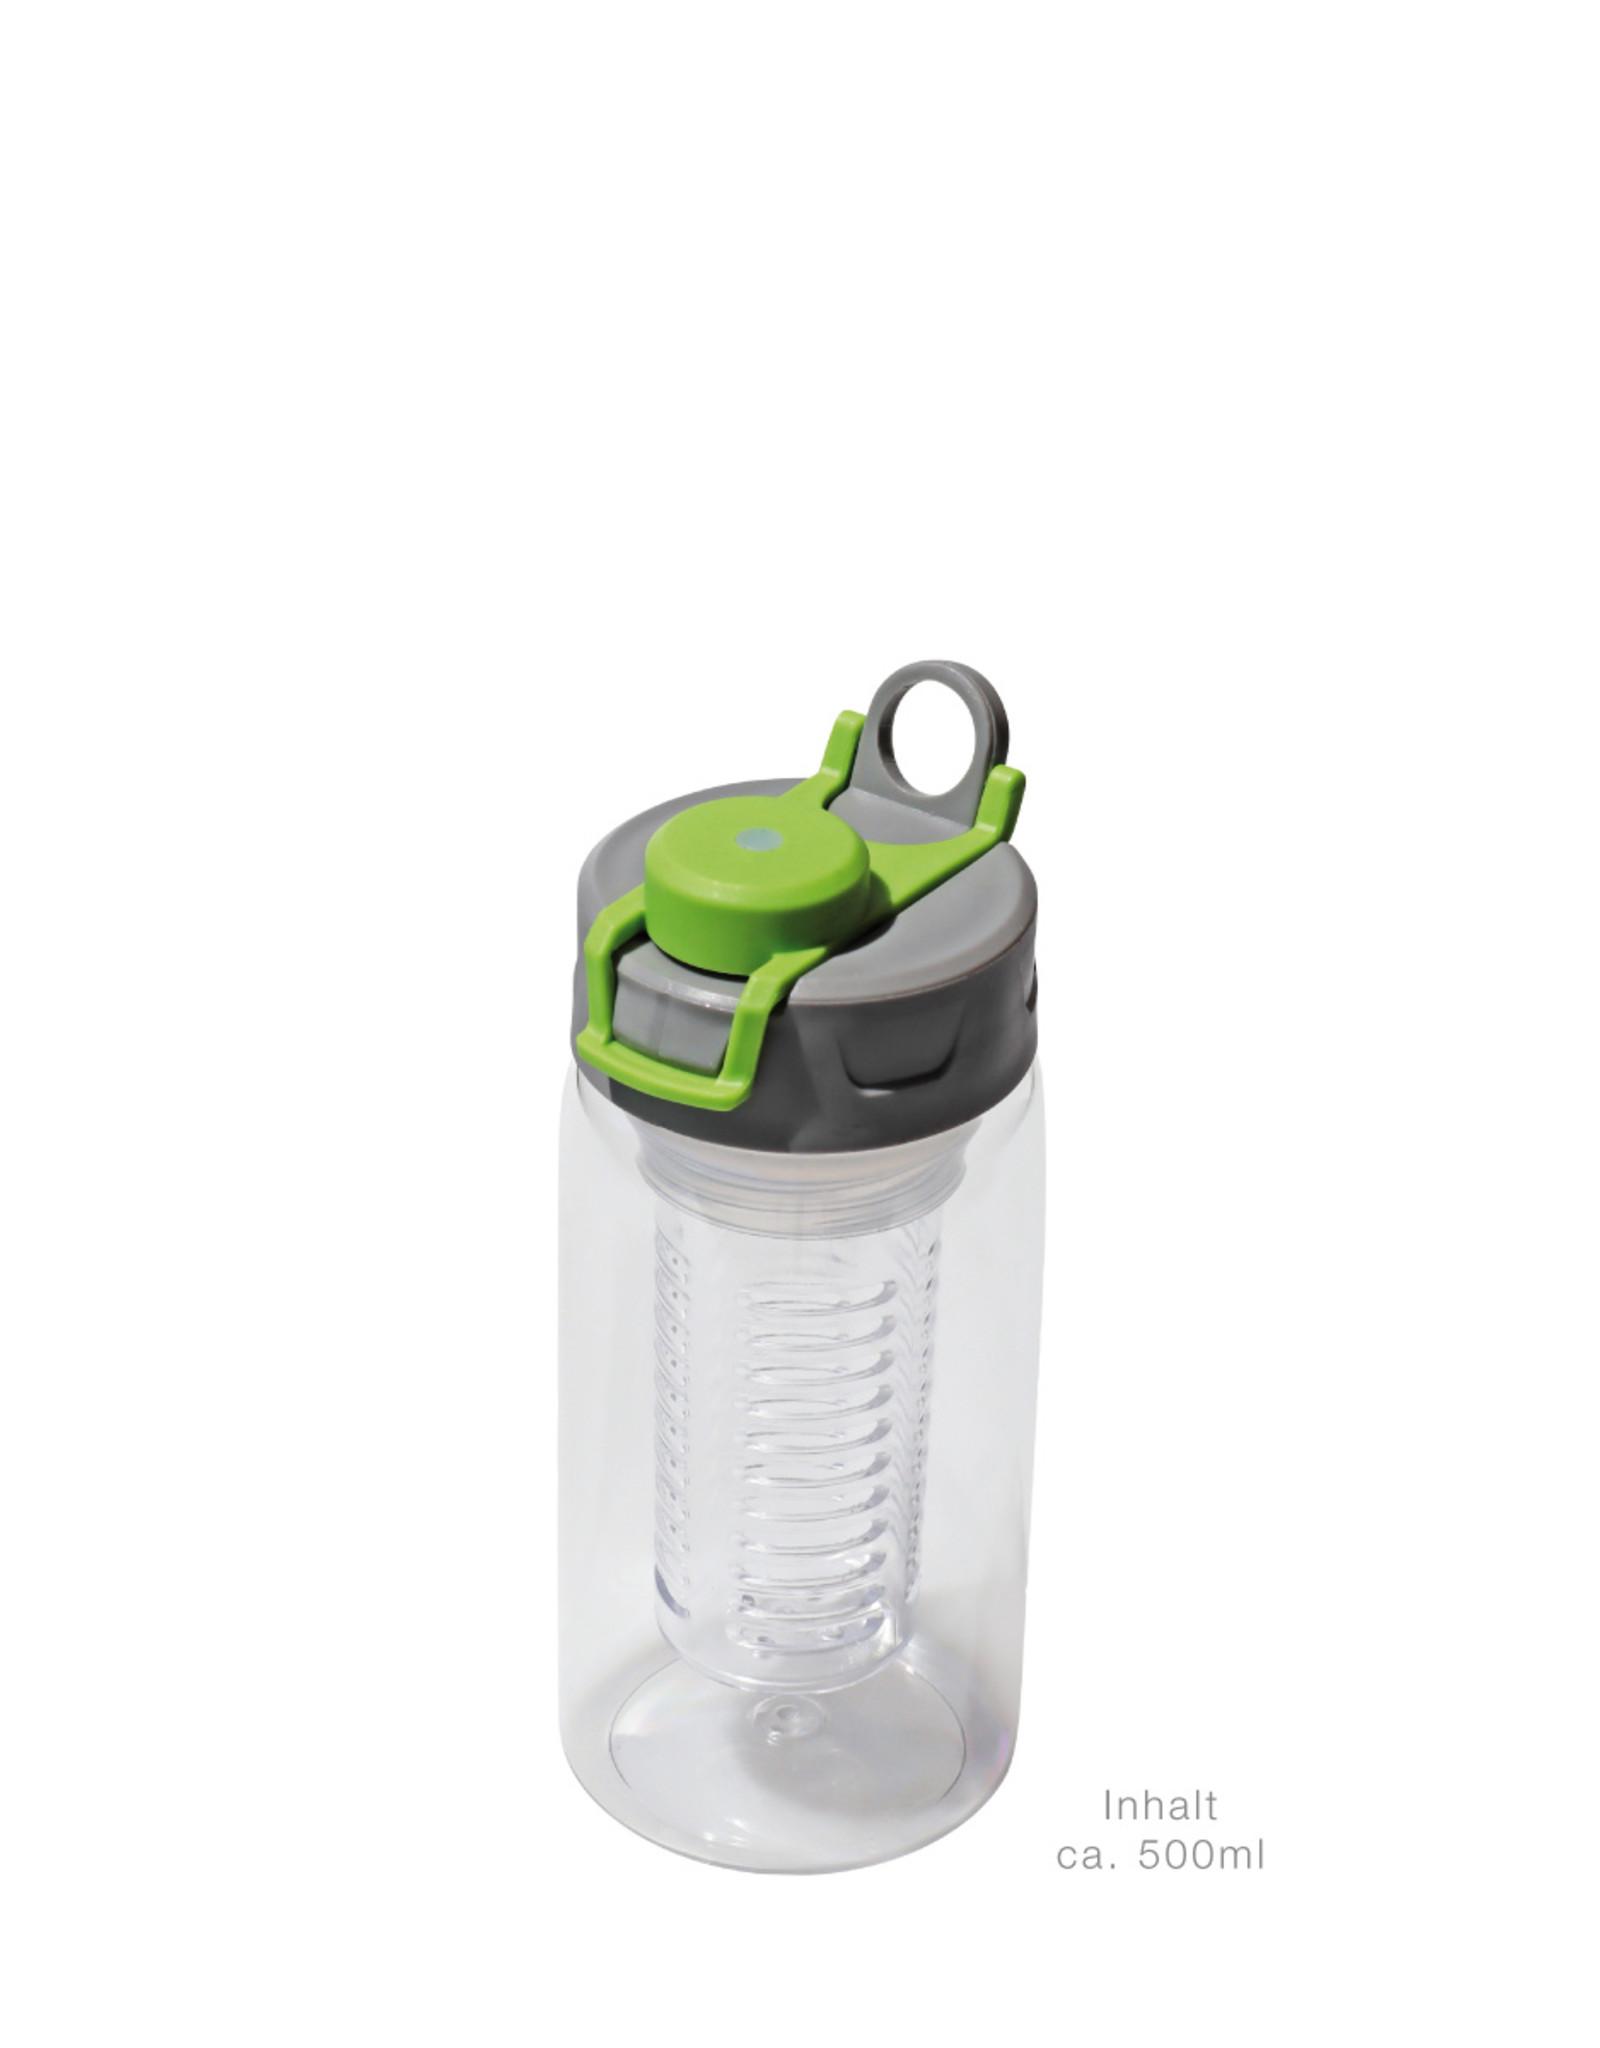 INVITALIS AQ 500 - Verde Neon